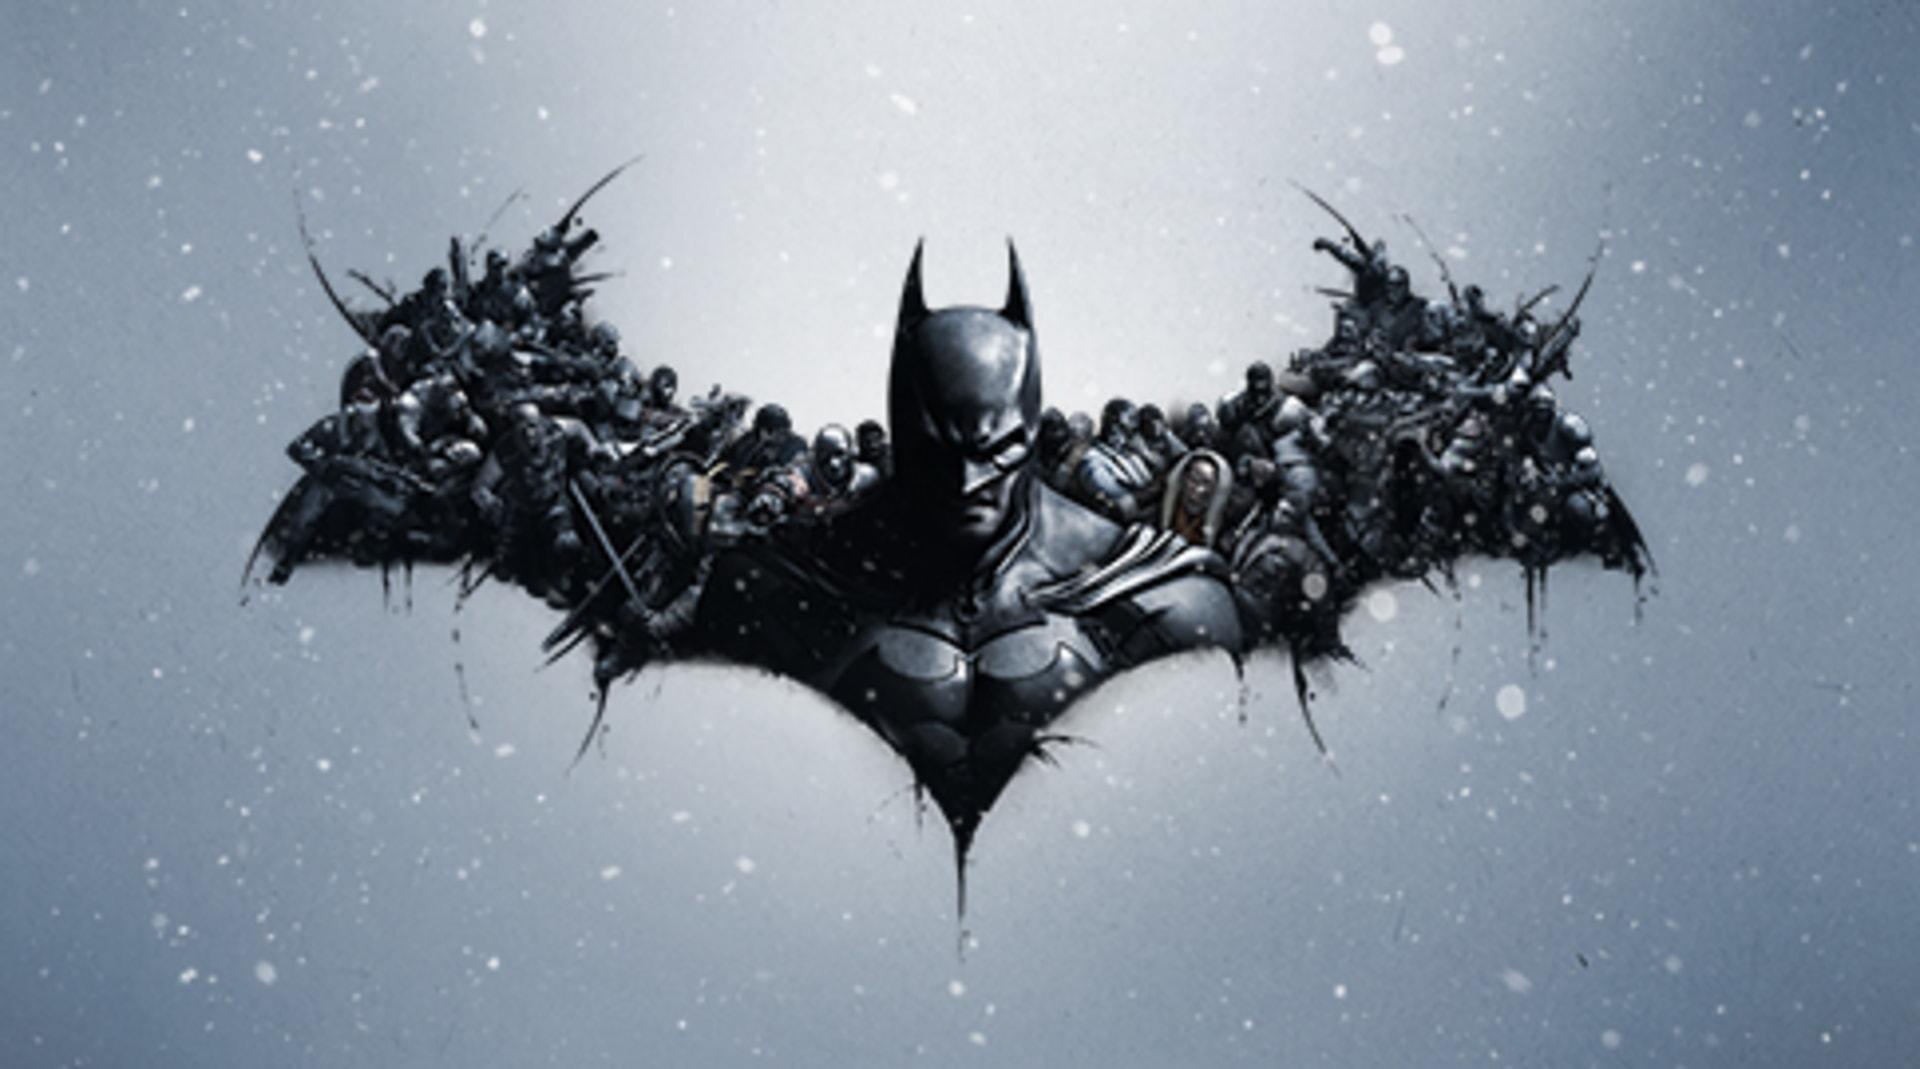 Batman: Arkham Origins - Image 1